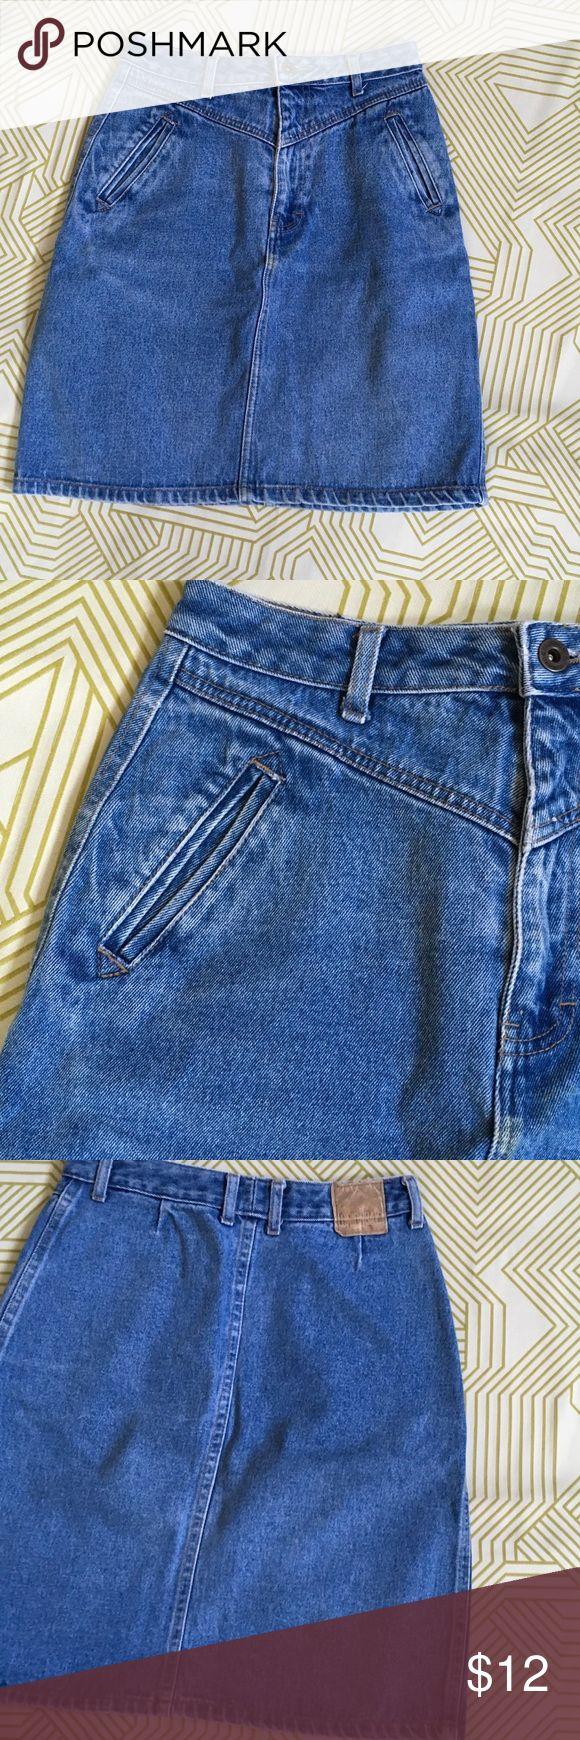 Vintage Unionbay Denim Skirt Size 9 Broken in with love...great western like Denim Skirt. Juniors size 9. Fits like a Ladies 8. UNIONBAY Skirts Midi